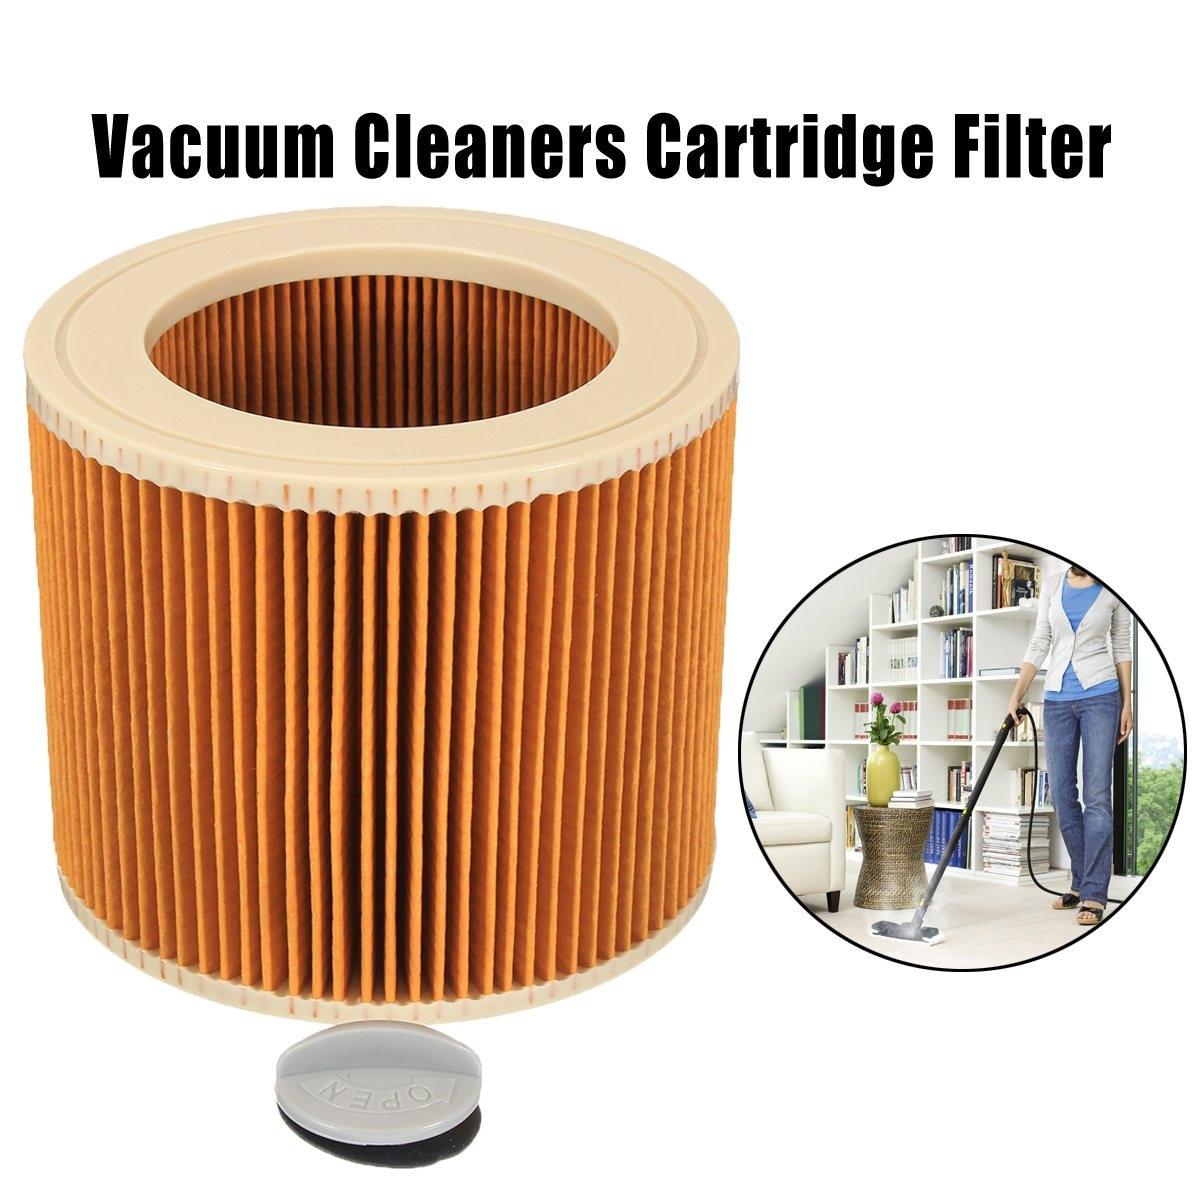 KROAK Car Vacuum Cleaners Cartridge Filter Fit for Karcher A2004 A2054 Vacuum Cleaners Accessories